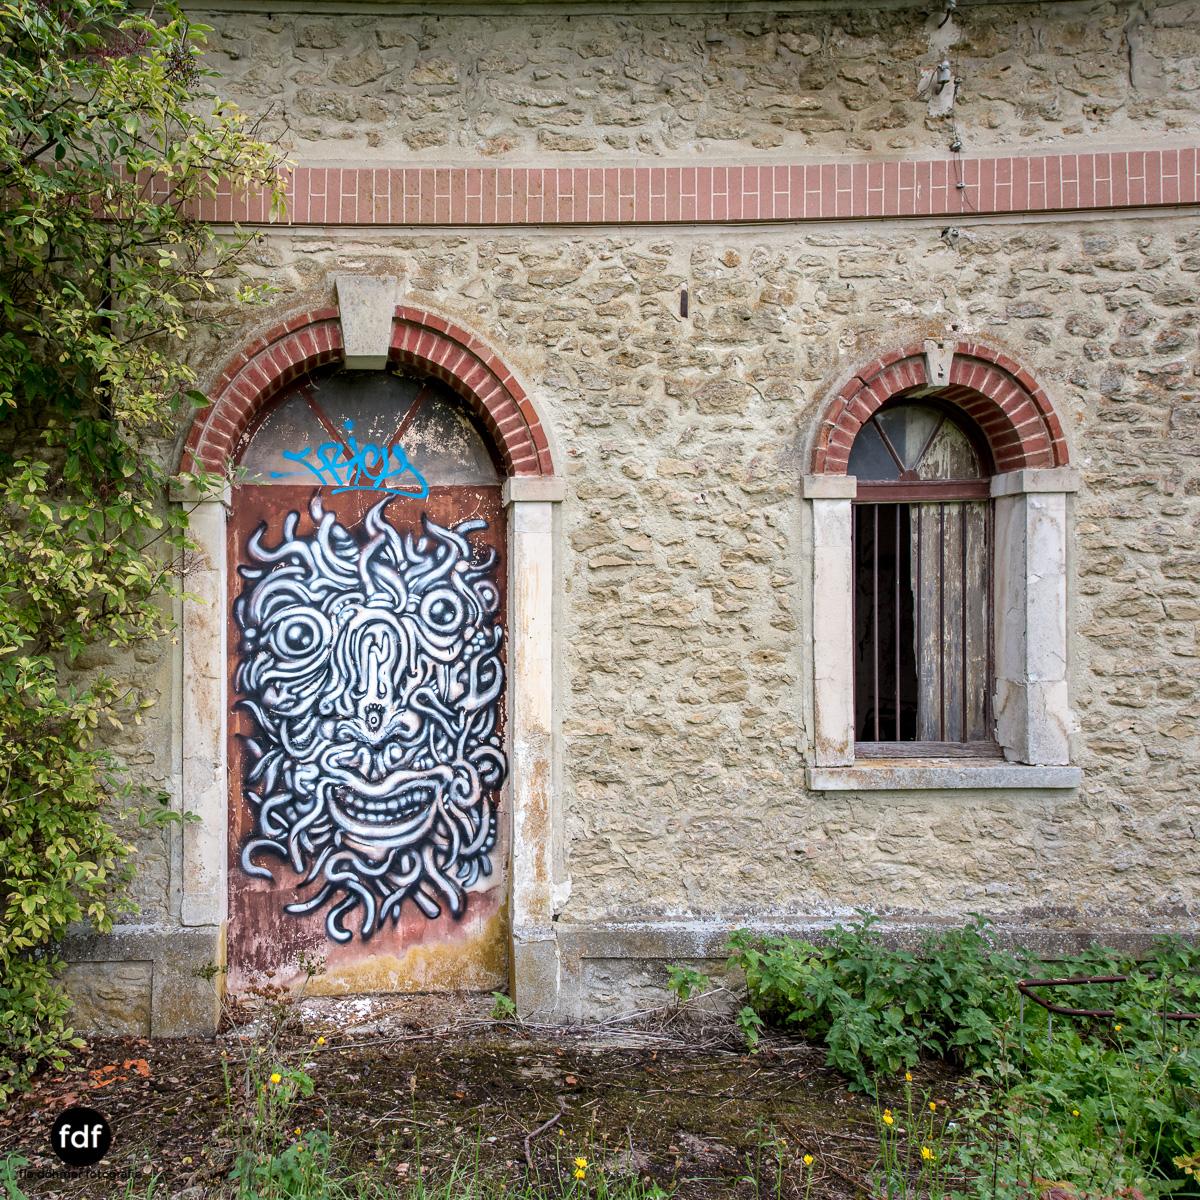 Chateau des Singes-Herrensitz-Lost Place-Frankreich-13.JPG